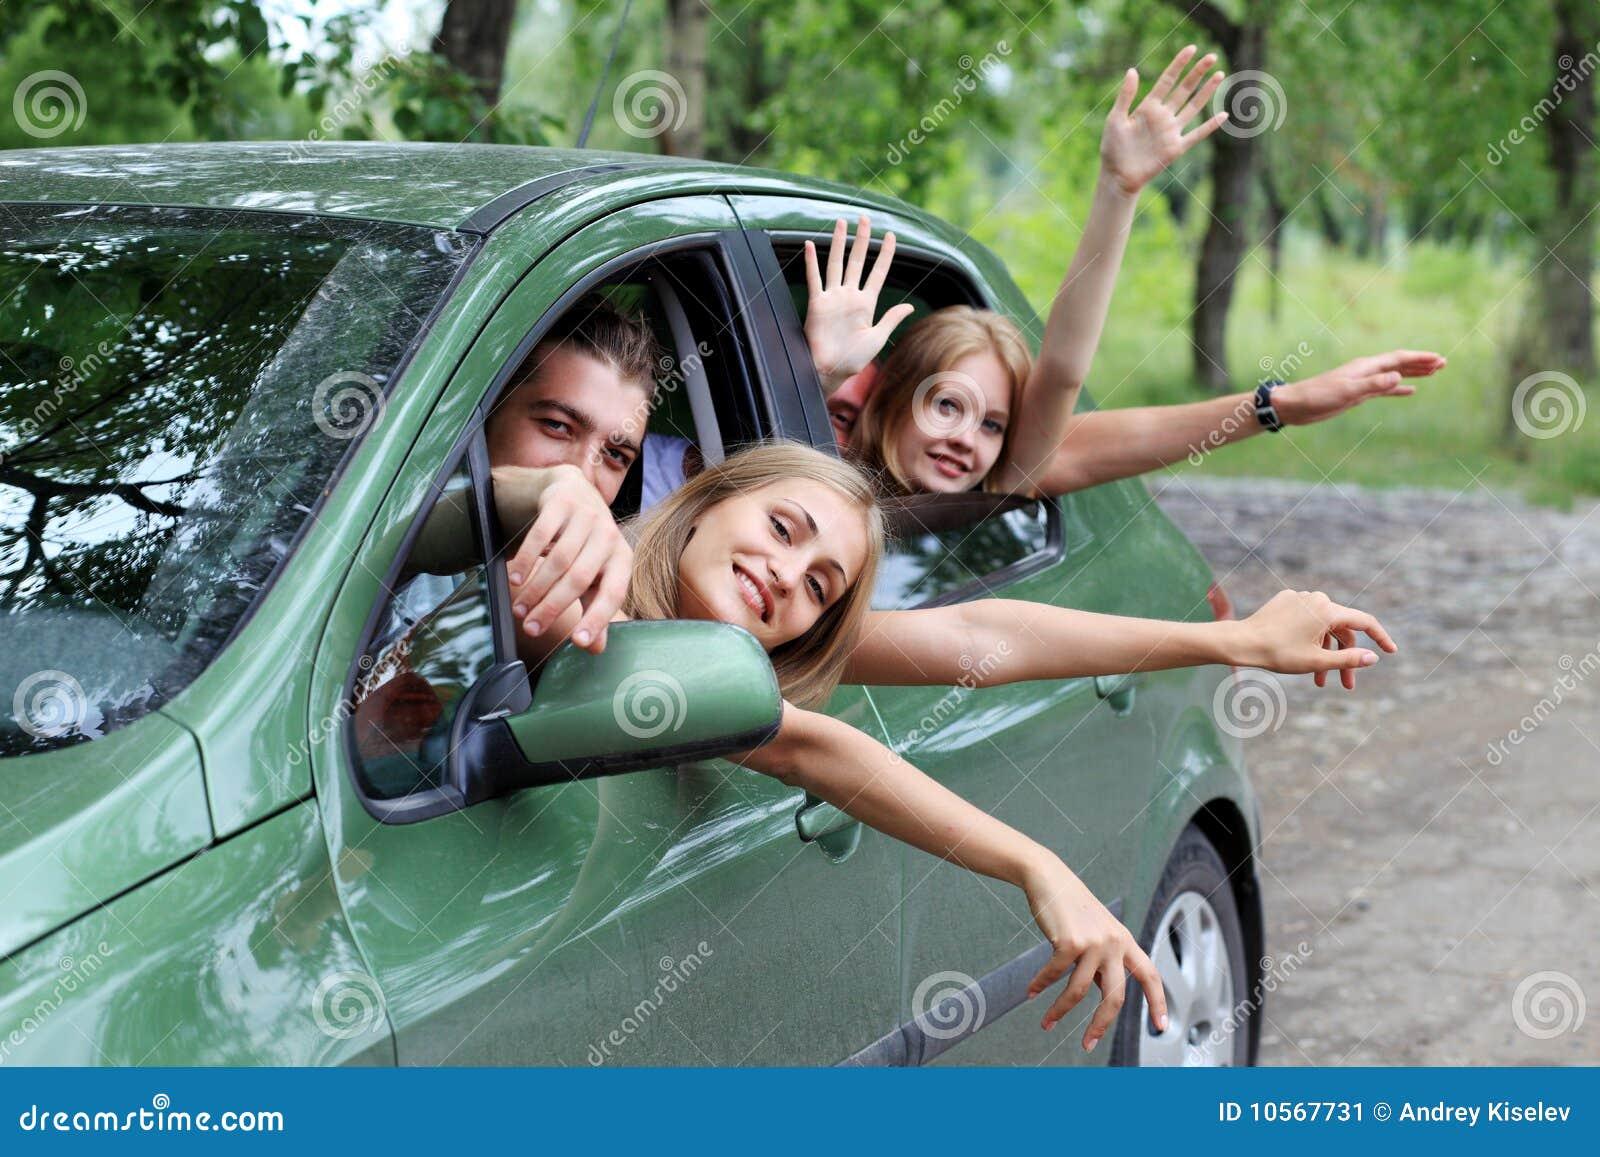 Car trip with friends